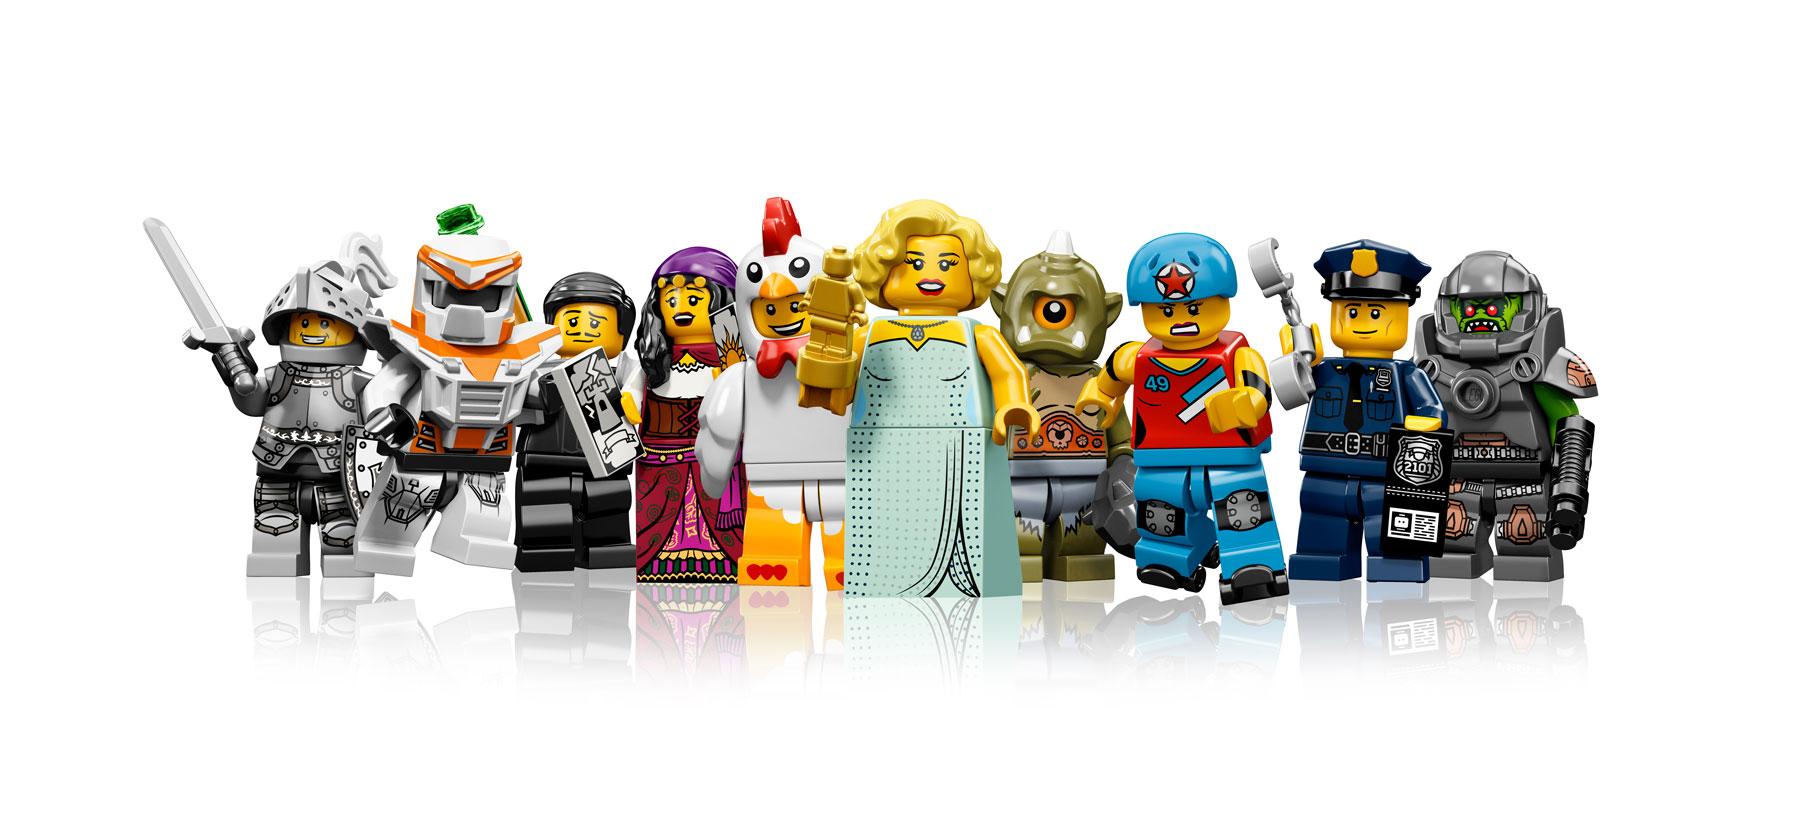 LEGO_Minifigures_Online_Lineup_WhiteBackground-1800